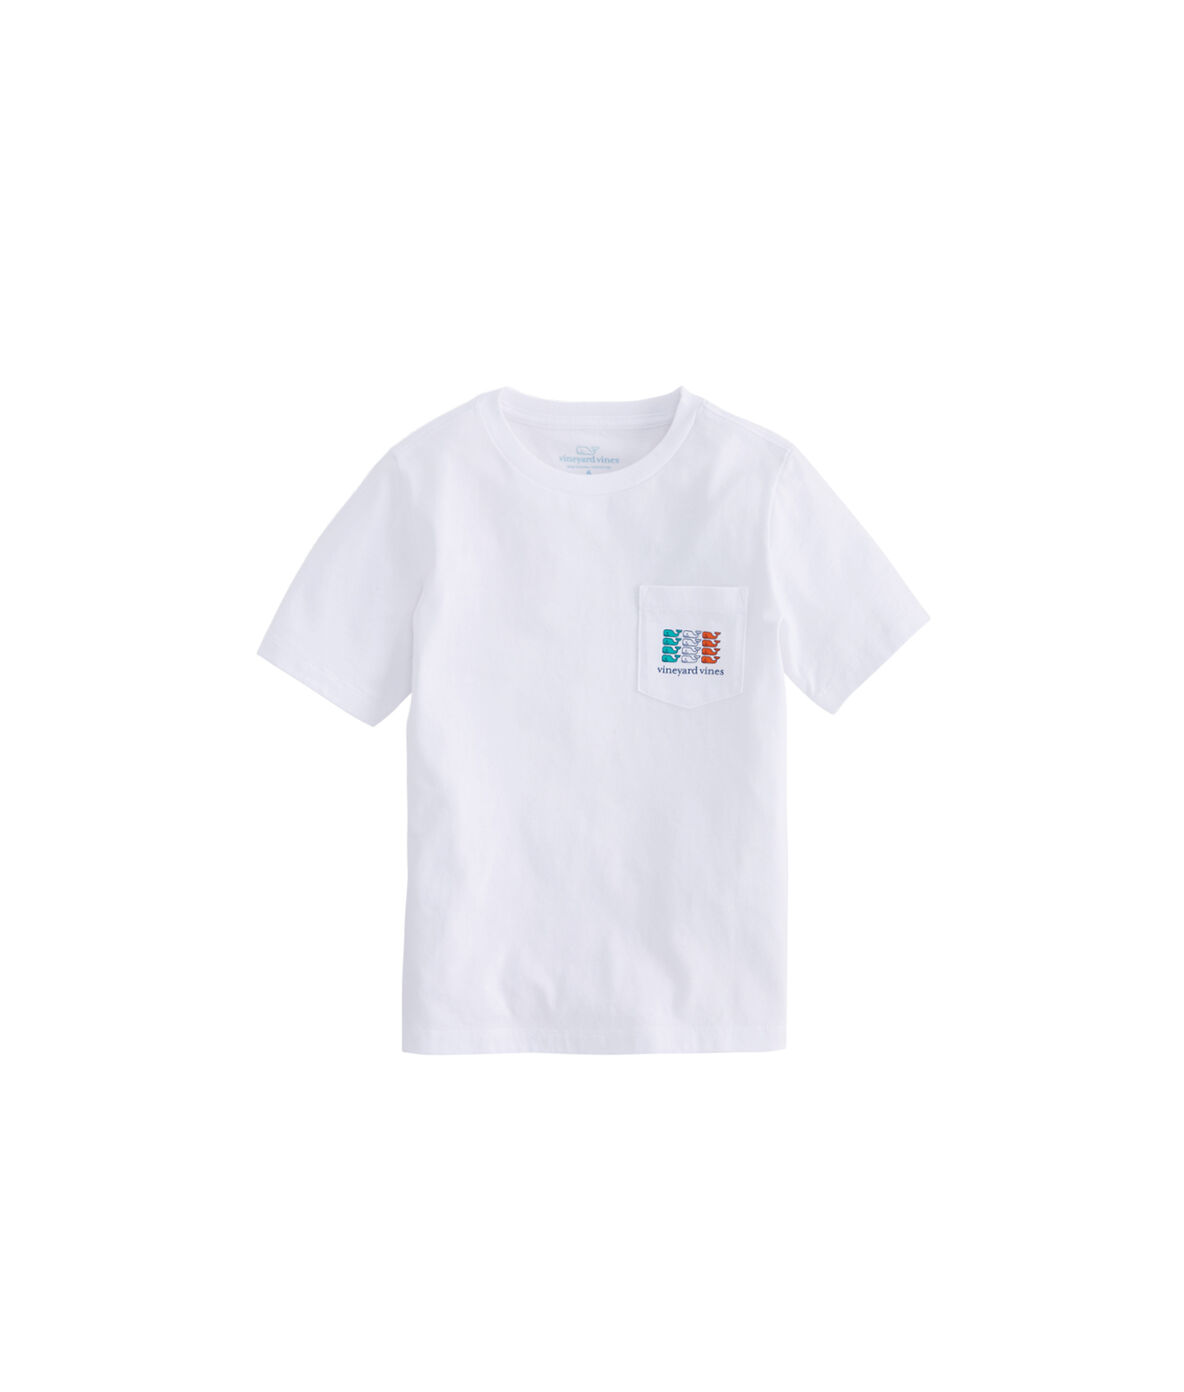 Details about  /NWT Vineyard Vines Boys S//S Irish Flag Whale Pocket T-Shirt Size 7